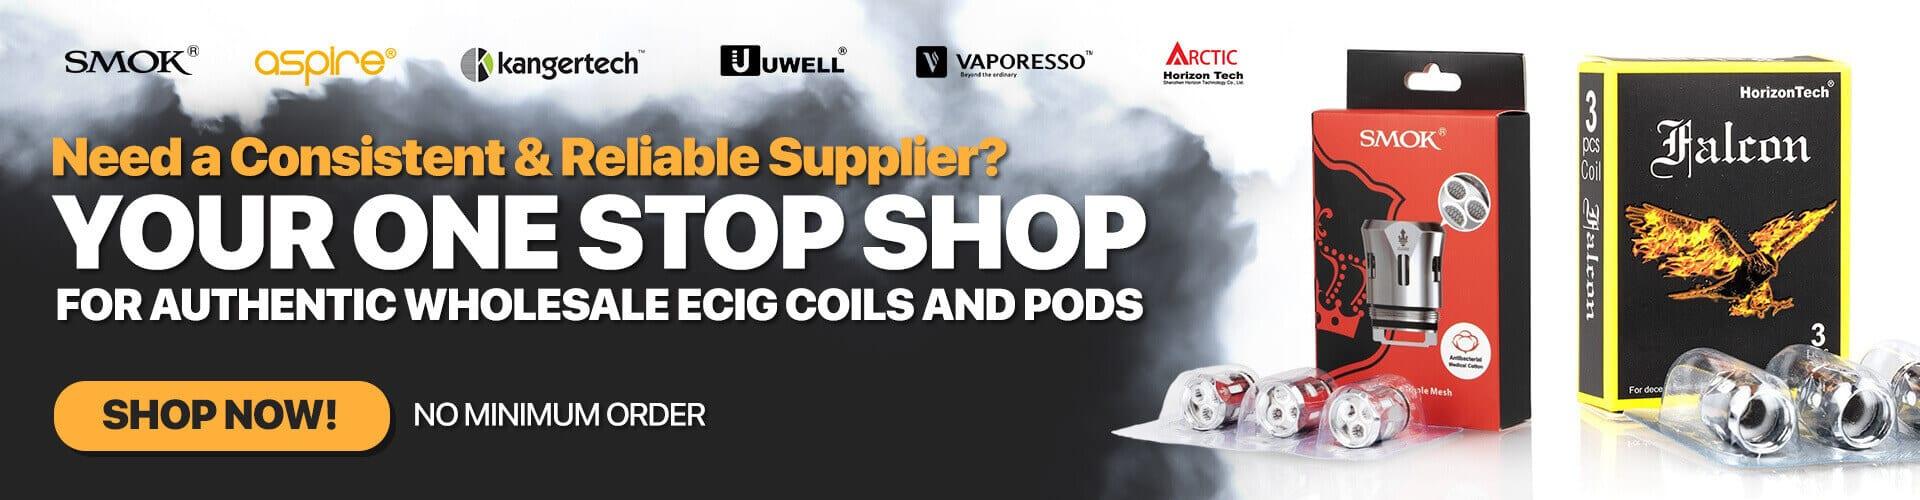 Wholesale Vapor Products, Electronic Cigarette Distributor